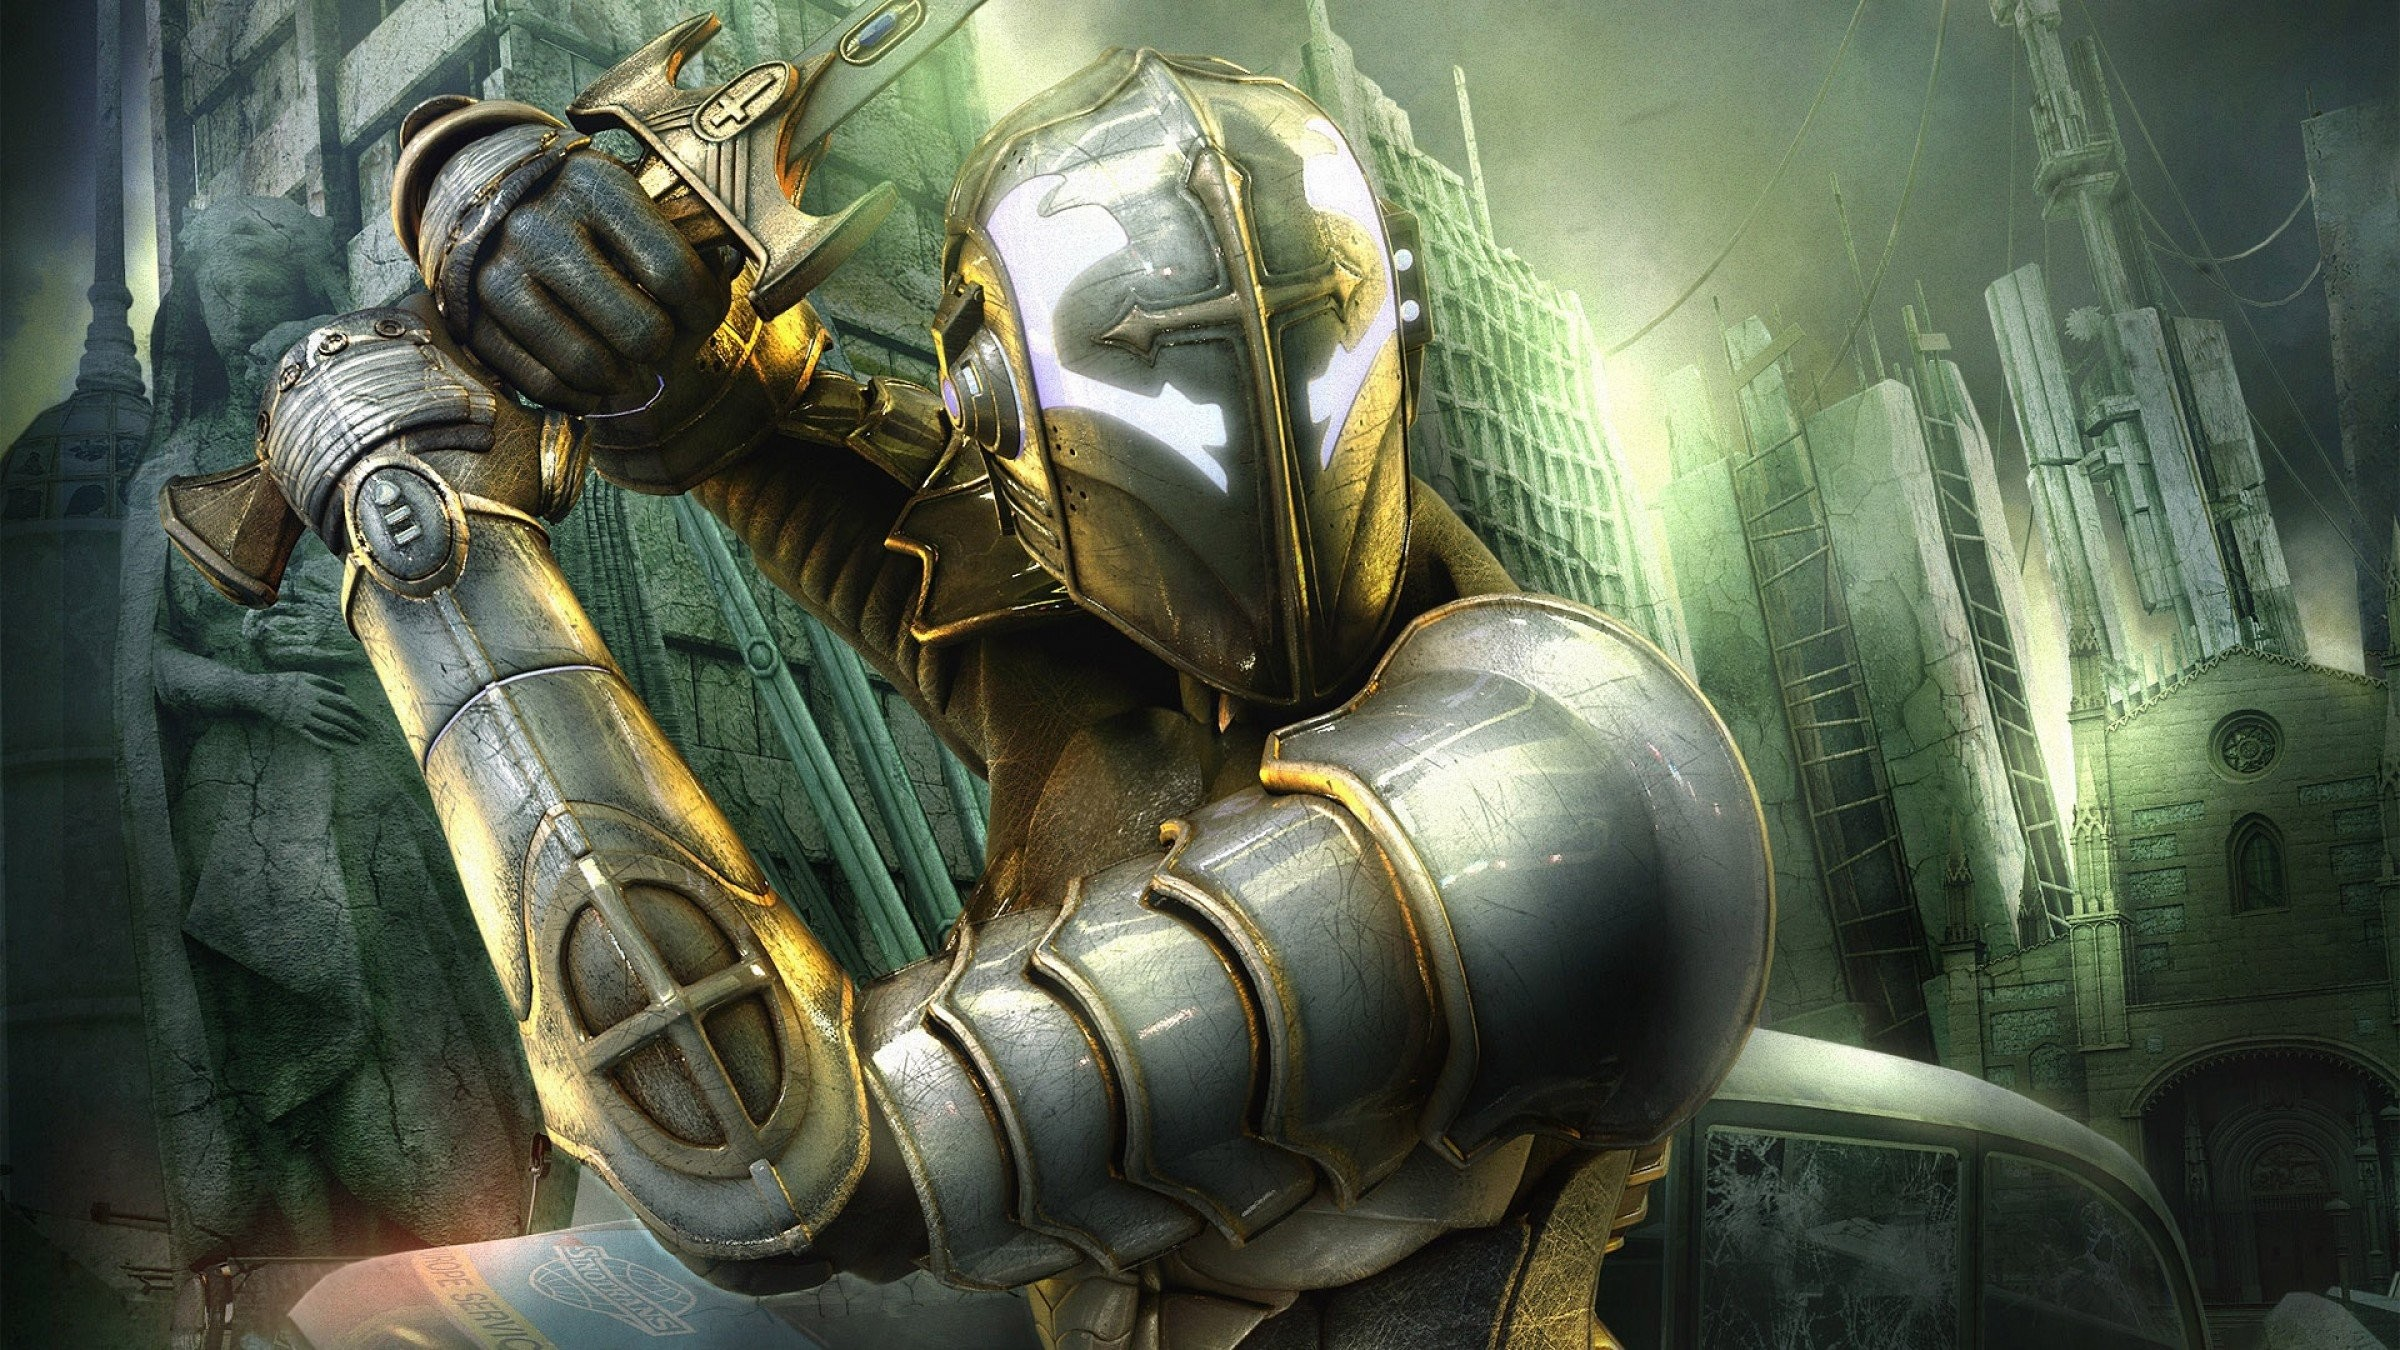 LONDON fantasy action sci-fi warrior knight armor wallpaper background .